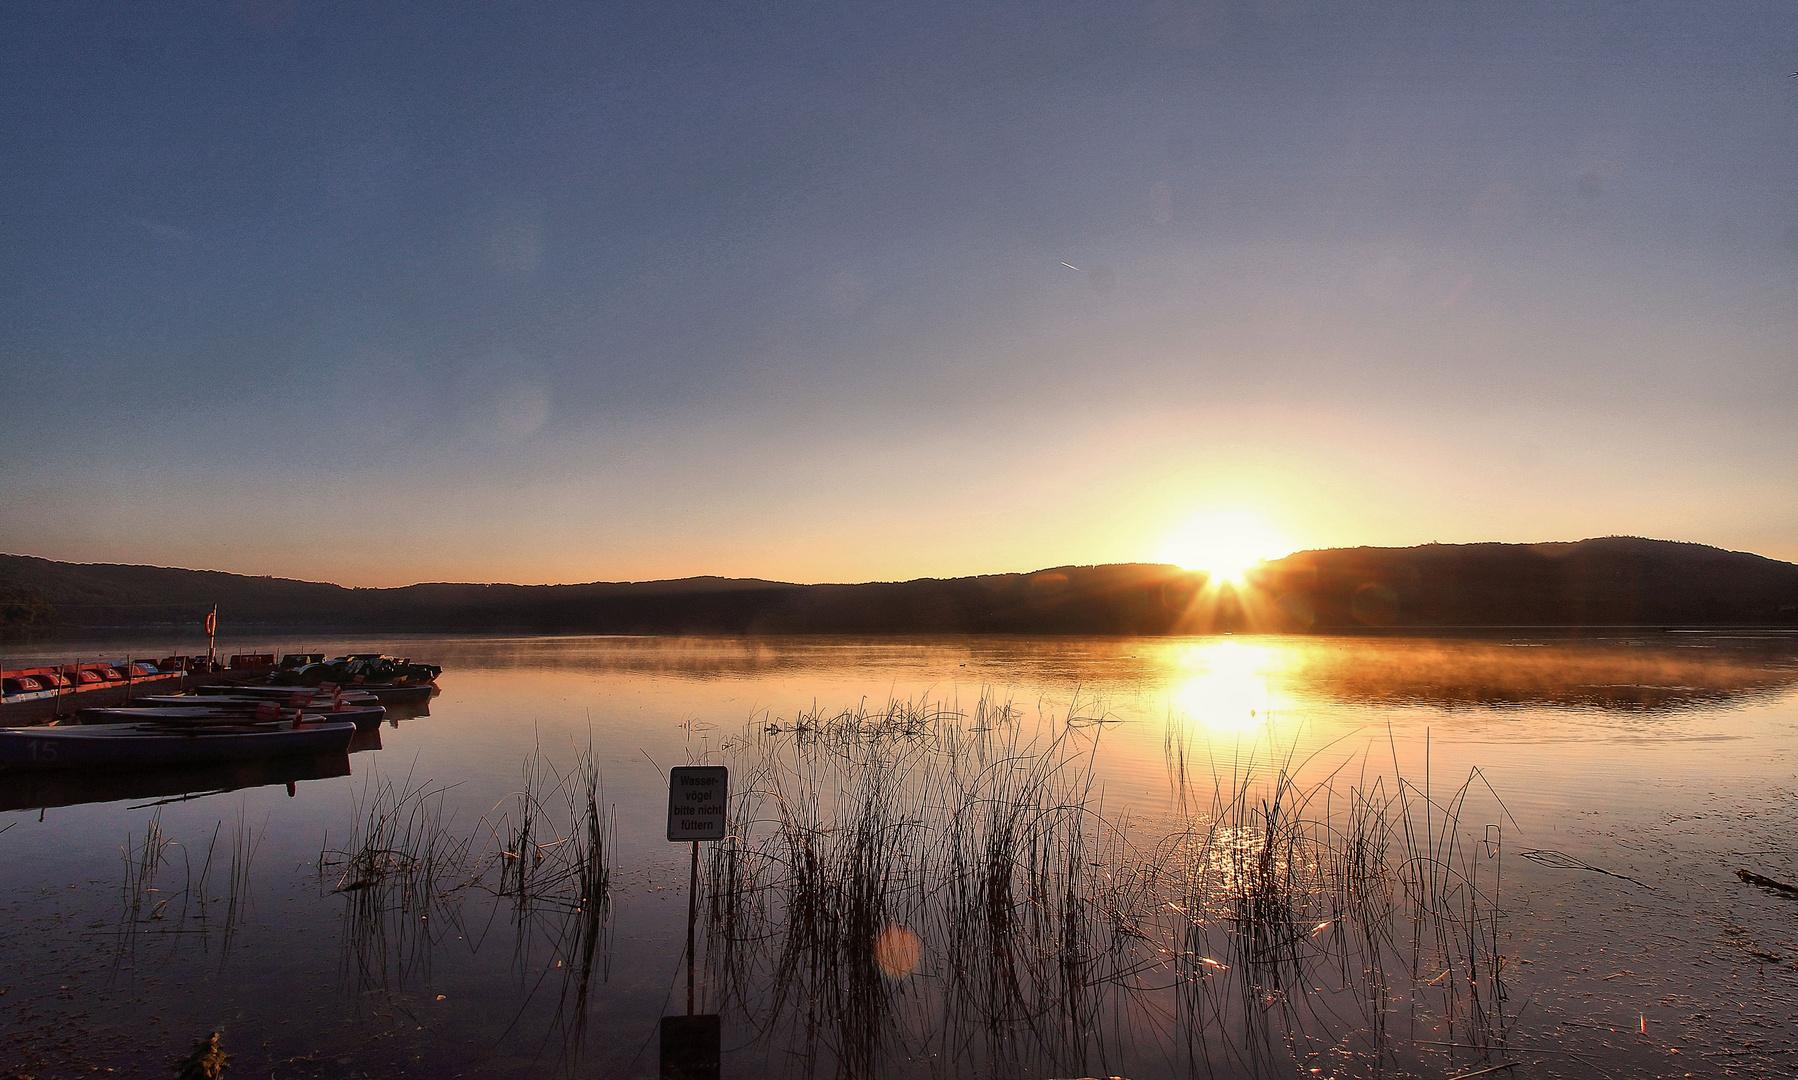 Sonnenaufgang am Laacher See No. 2